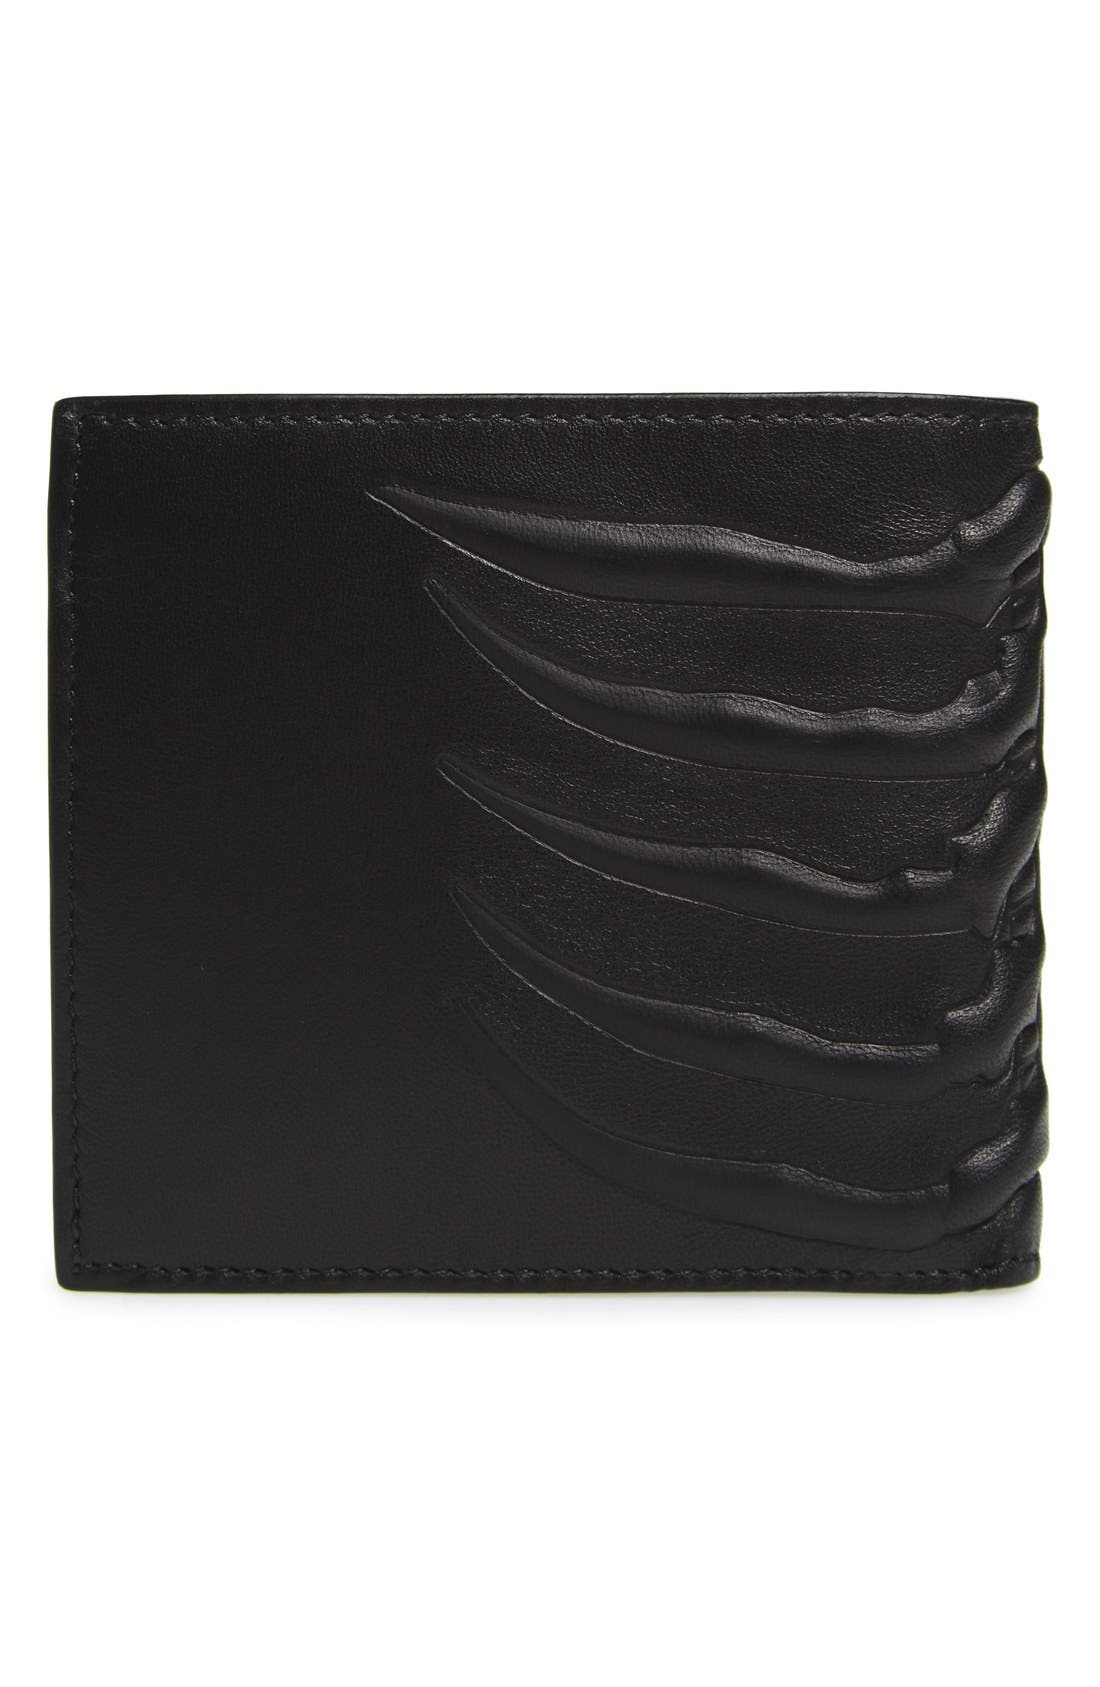 Ribcage Leather Wallet,                             Alternate thumbnail 3, color,                             Black